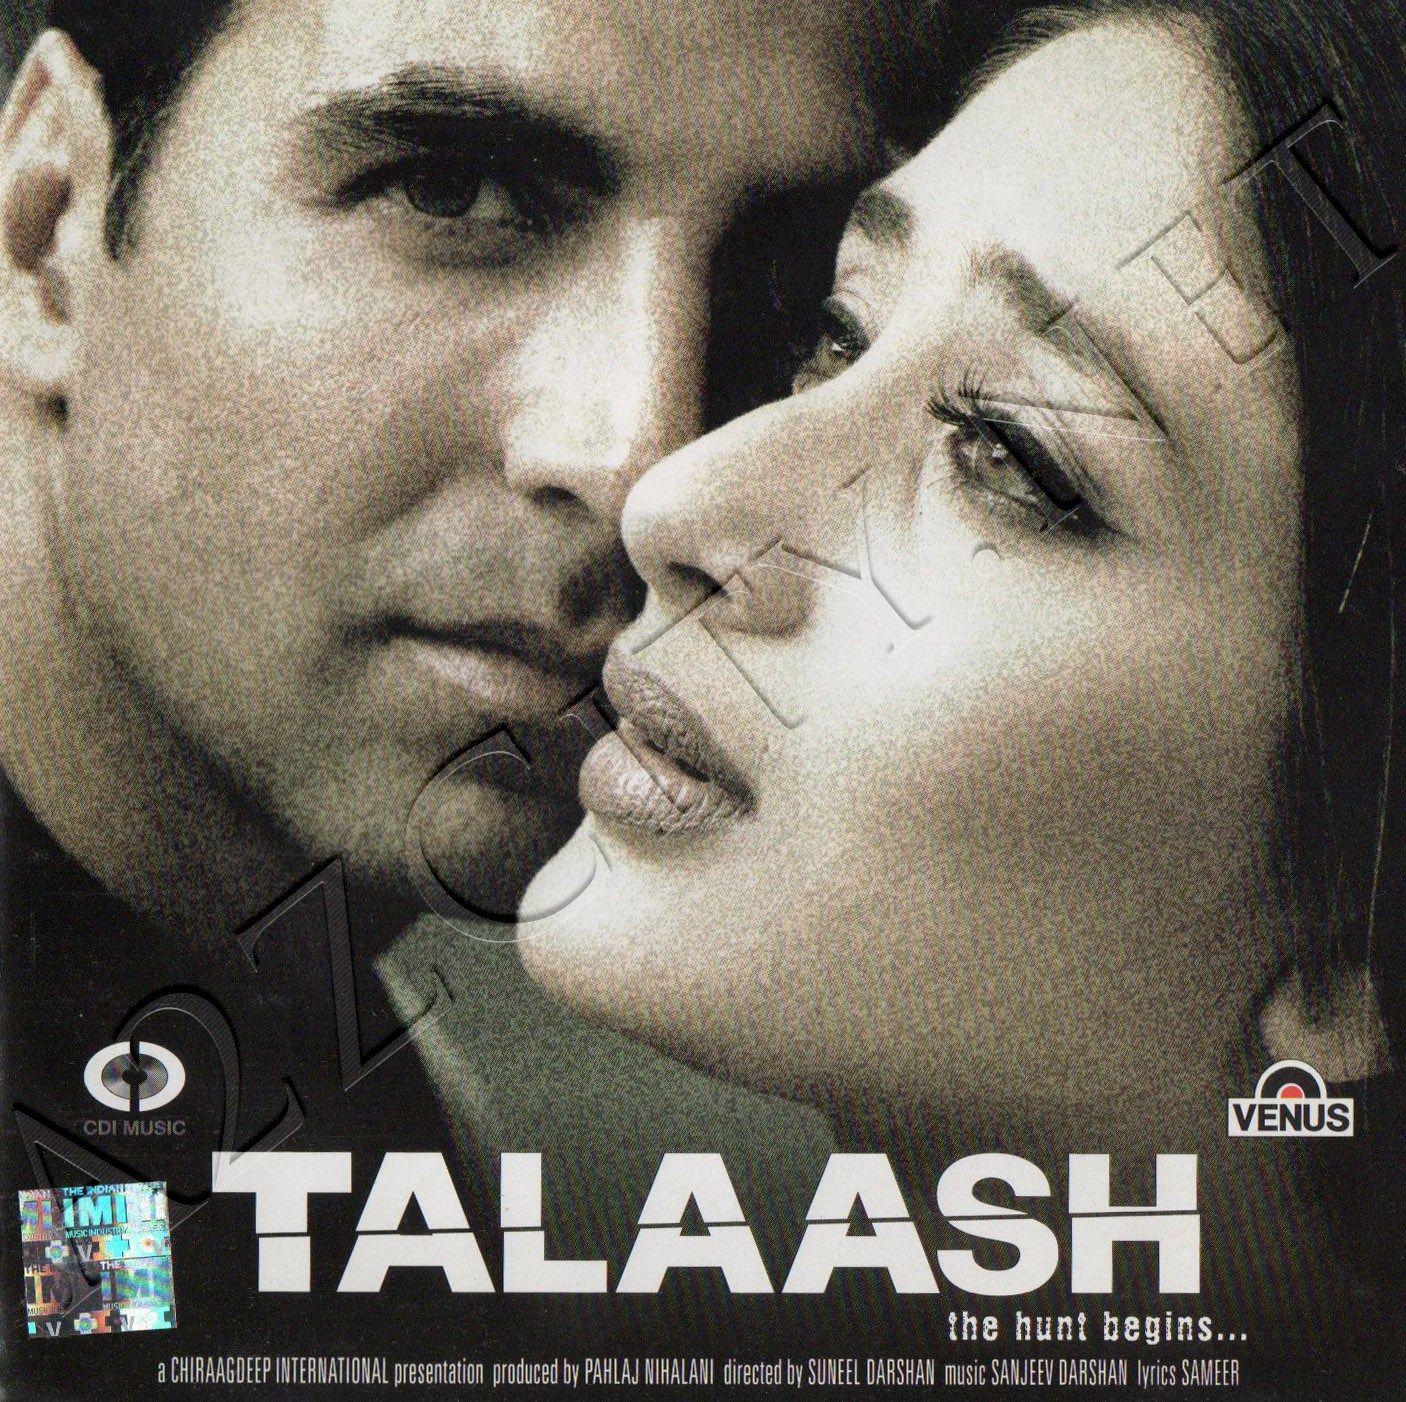 Talaash The Hunt Begins 2002 Flac Bollywood Songs Movie Songs Bollywood Movie